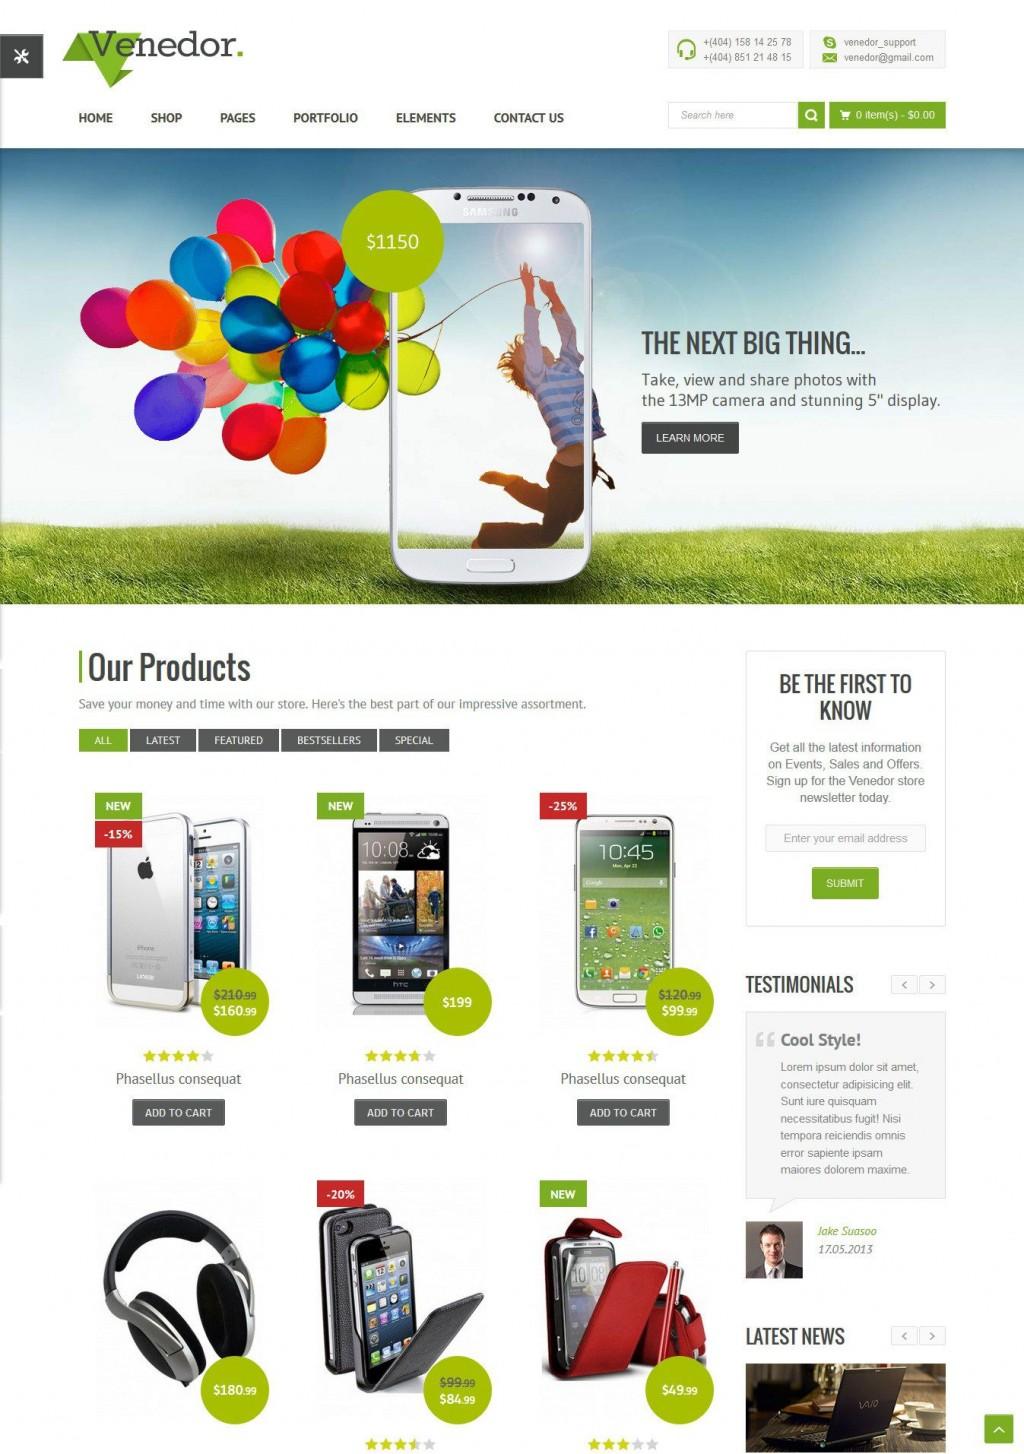 009 Breathtaking Free Ecommerce Website Template Idea  Templates Github For Blogger Shopping Cart WordpresLarge